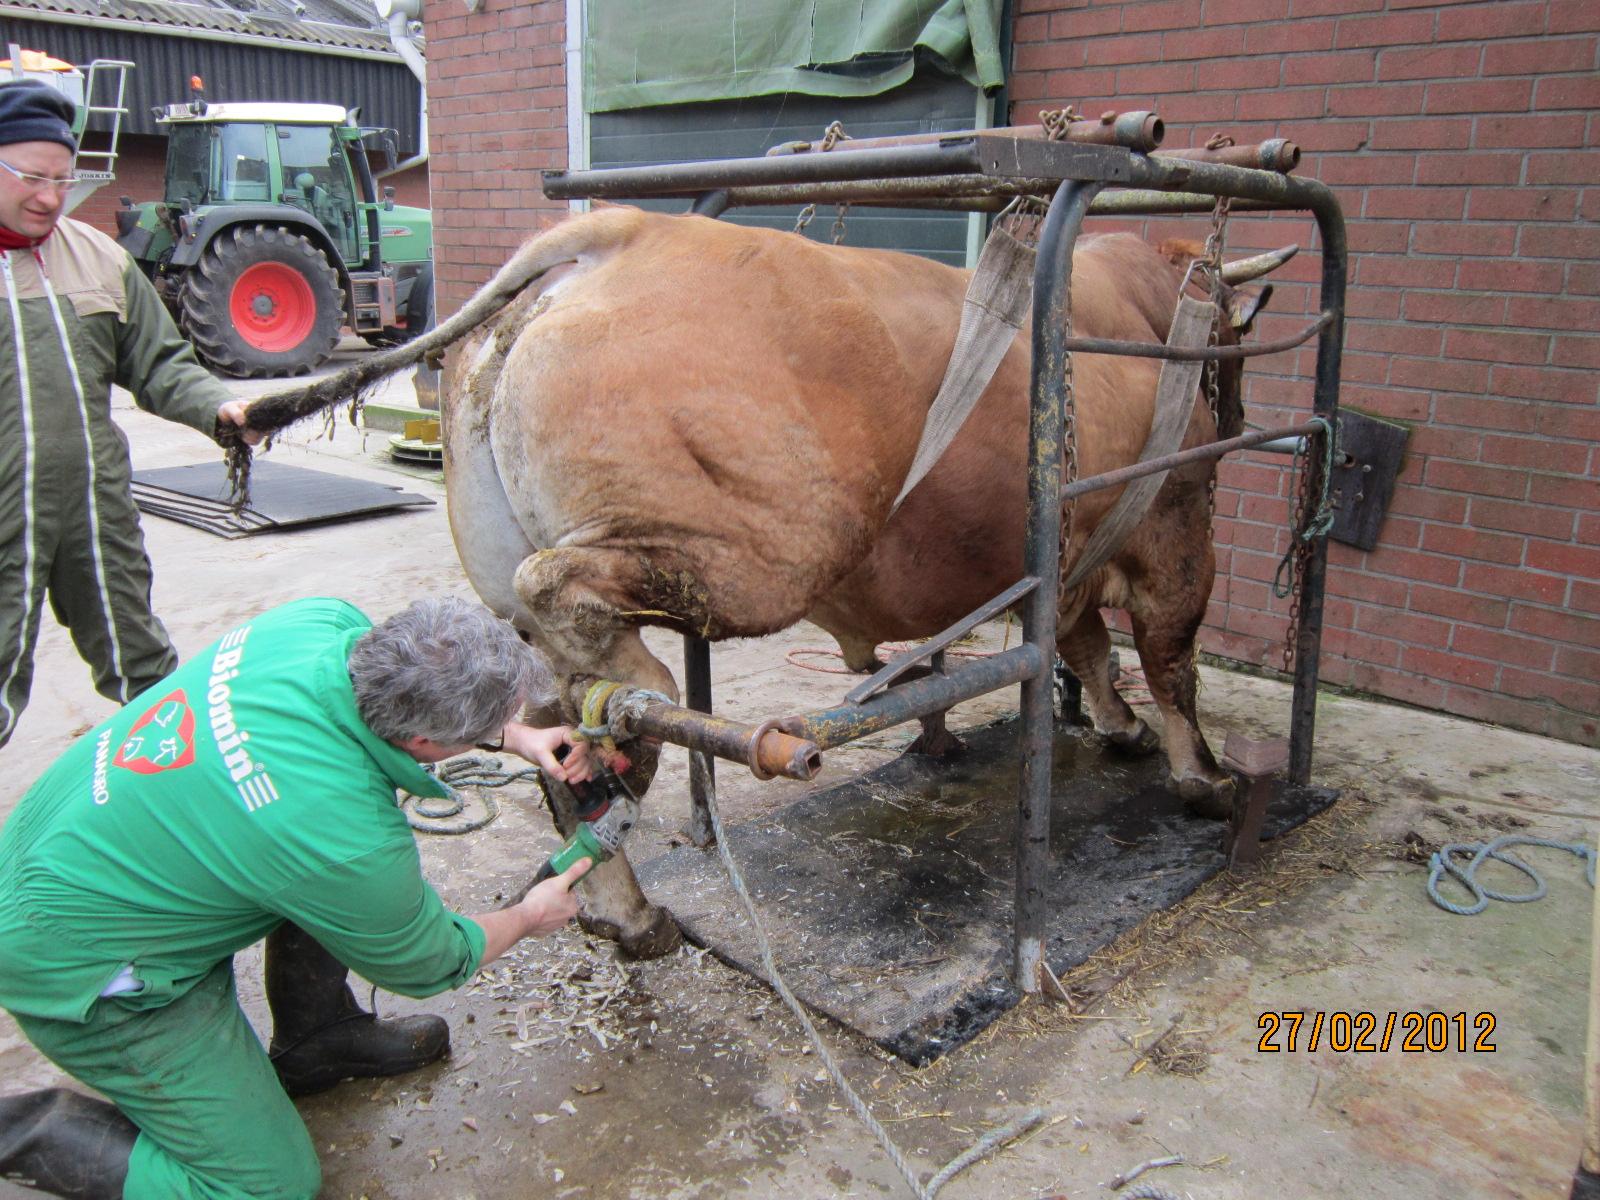 cfaa 47  6 apprentis agricoles en flandre du 18  02 au 10  03  2012  baln u00e9o et manucure  u00e0 la ferme